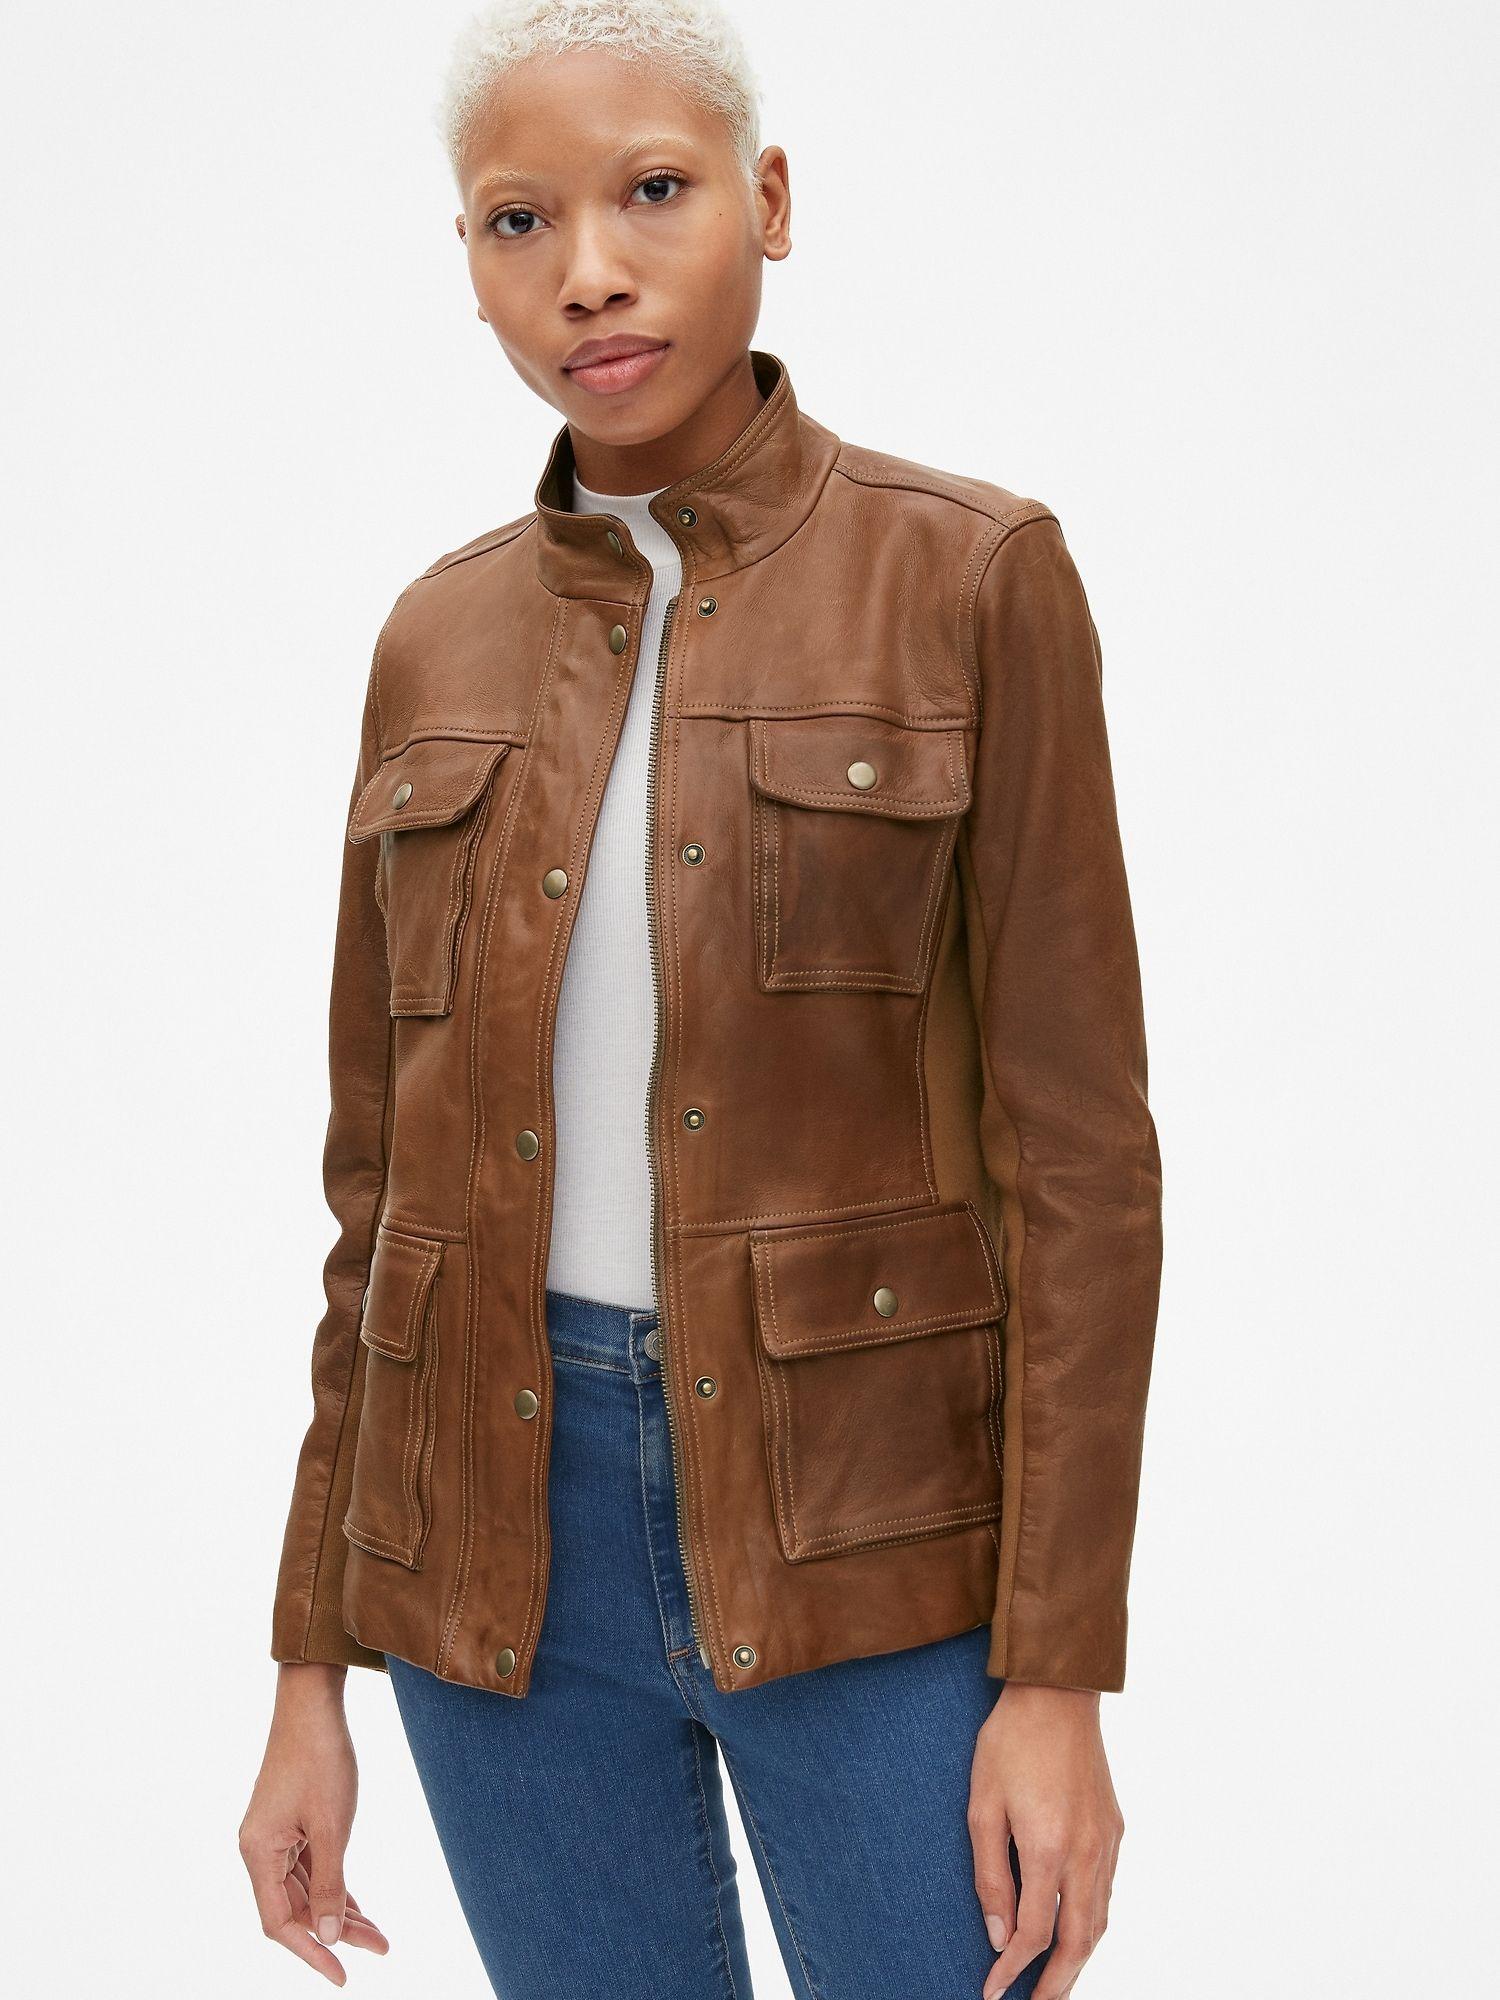 Utility Leather Jacket With Rib Knit Trim Gap Coats Jackets Women Stylish Outerwear Outerwear Women [ 2000 x 1500 Pixel ]